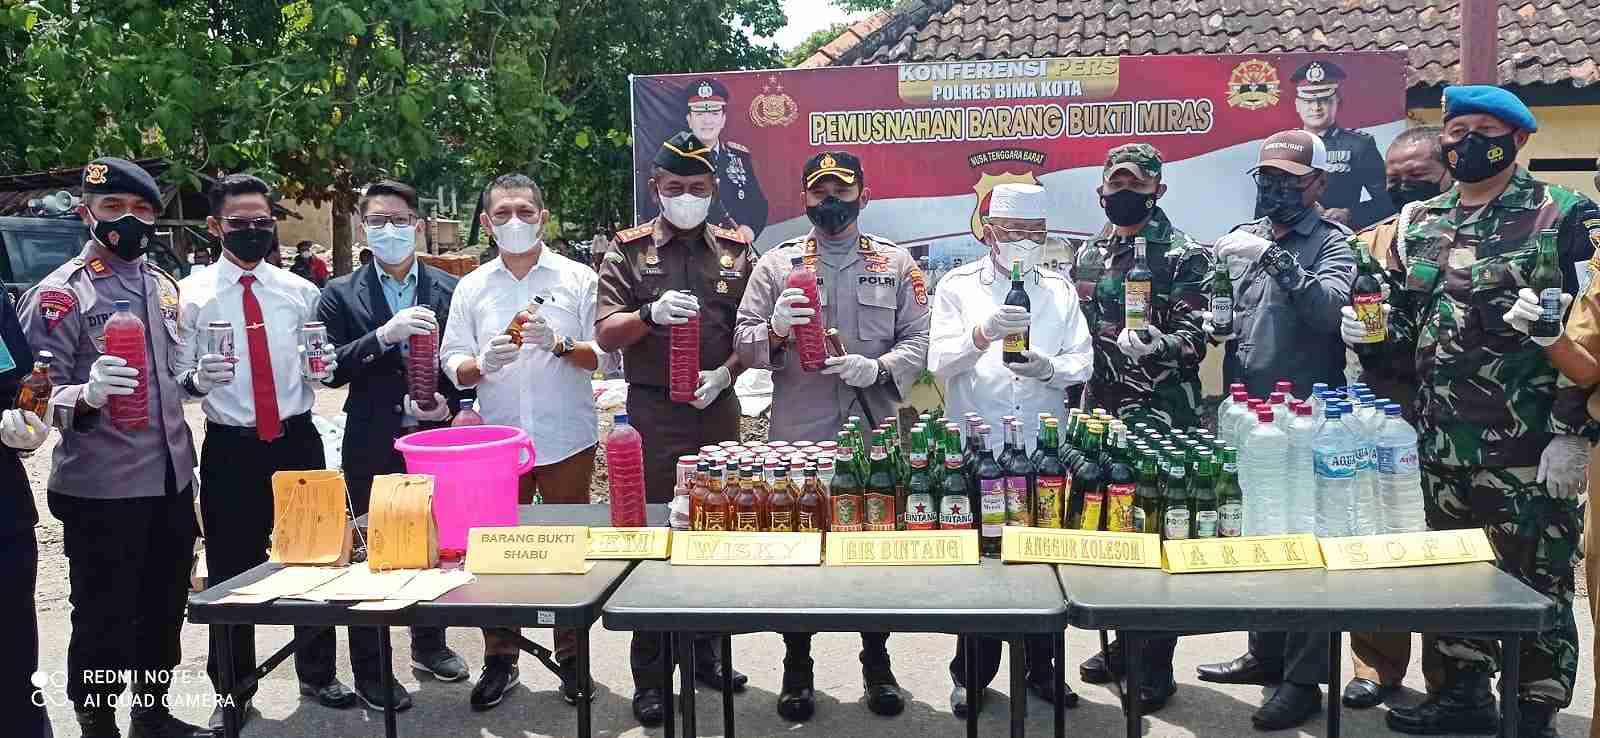 Polres Bima Kota Musnahkan Miras dan Narkotika